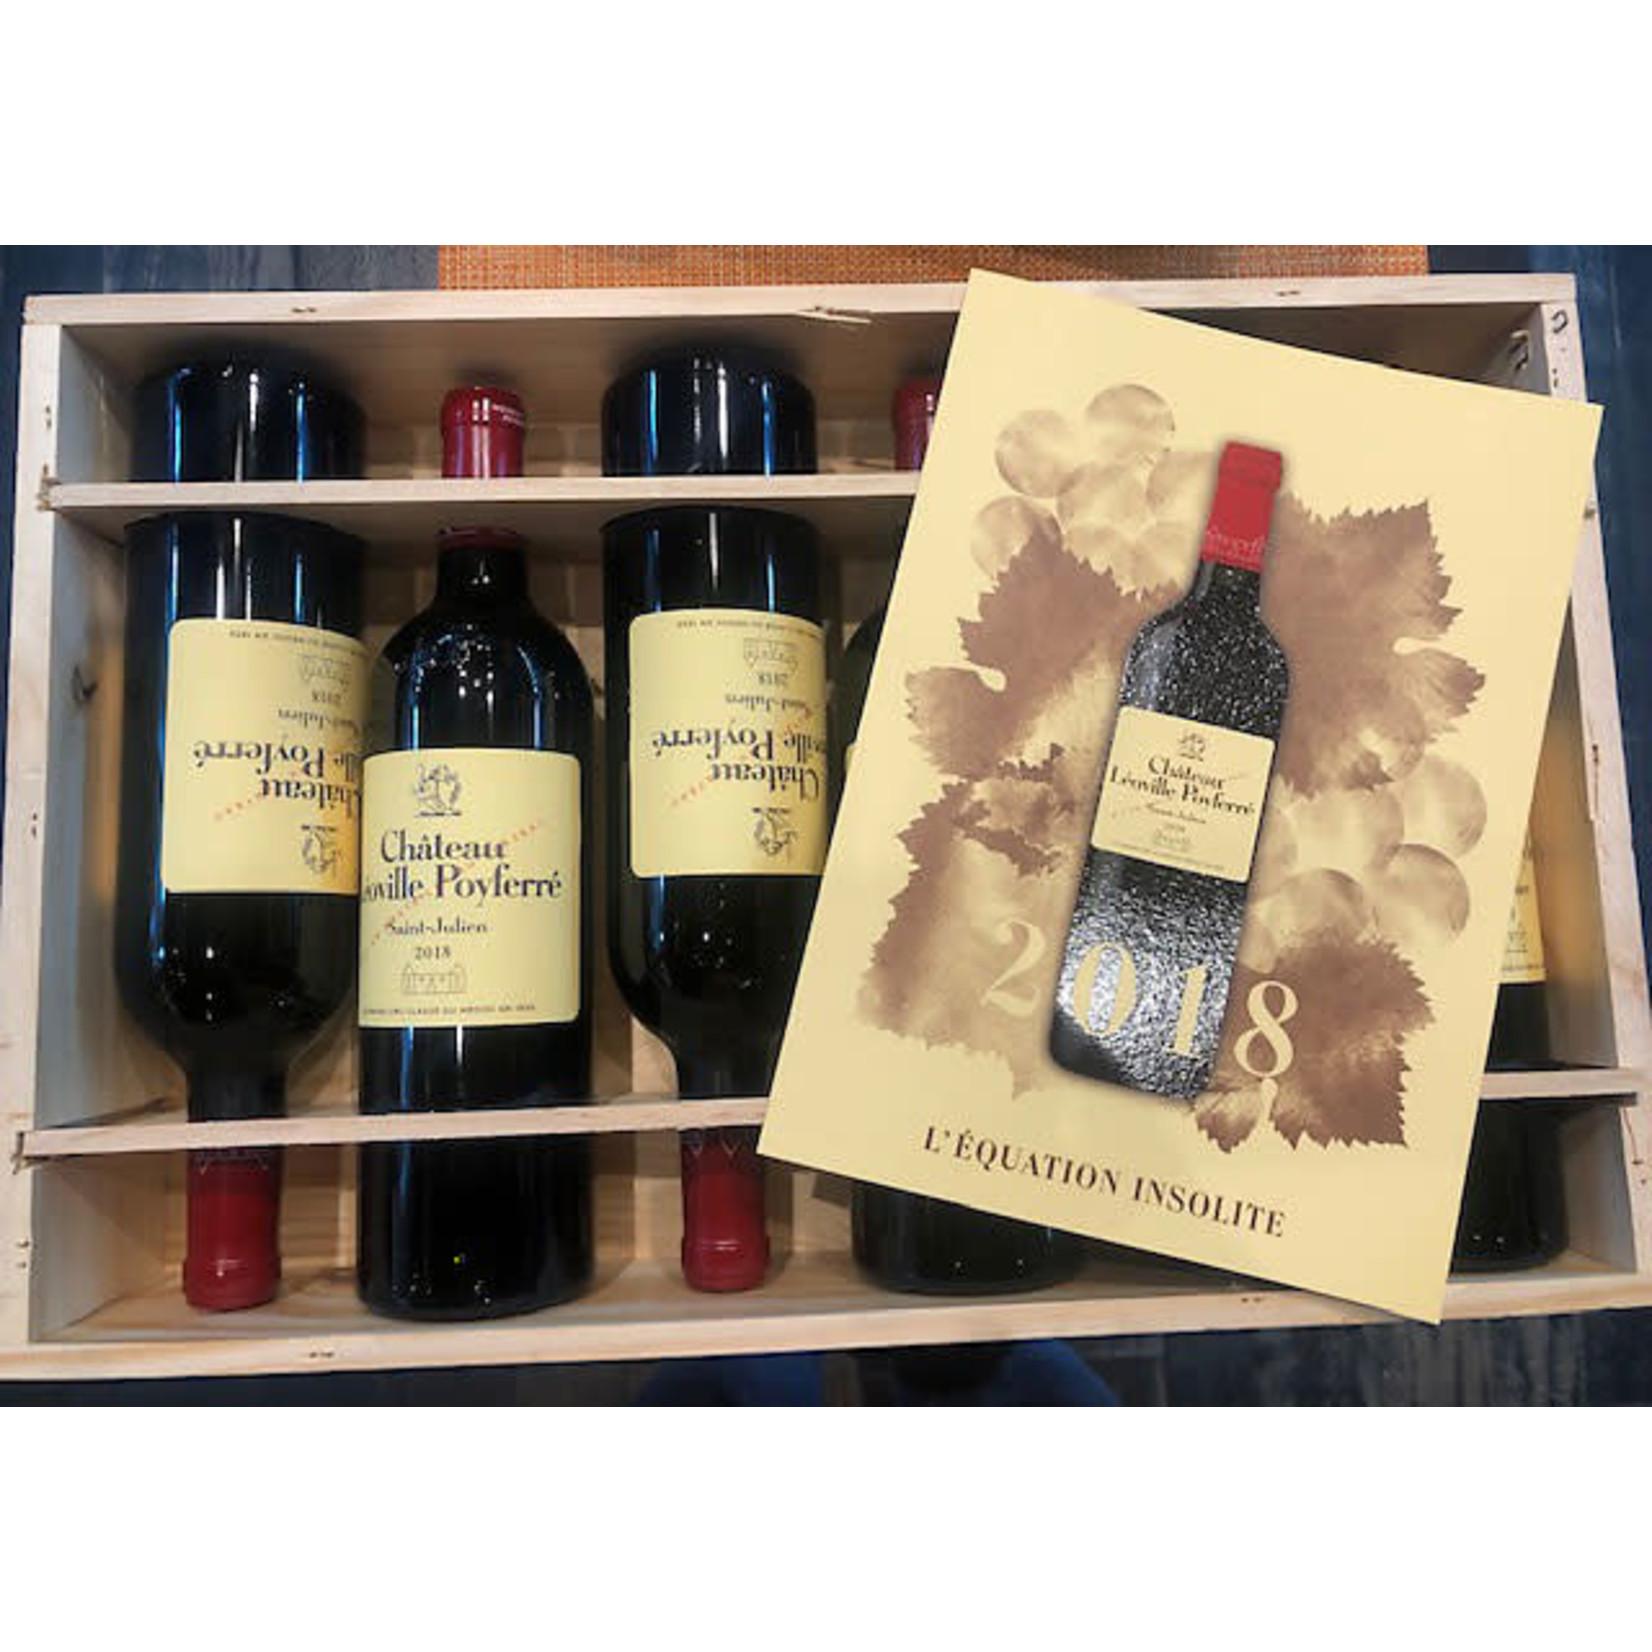 Wine Chateau Leoville Poyferre 2018